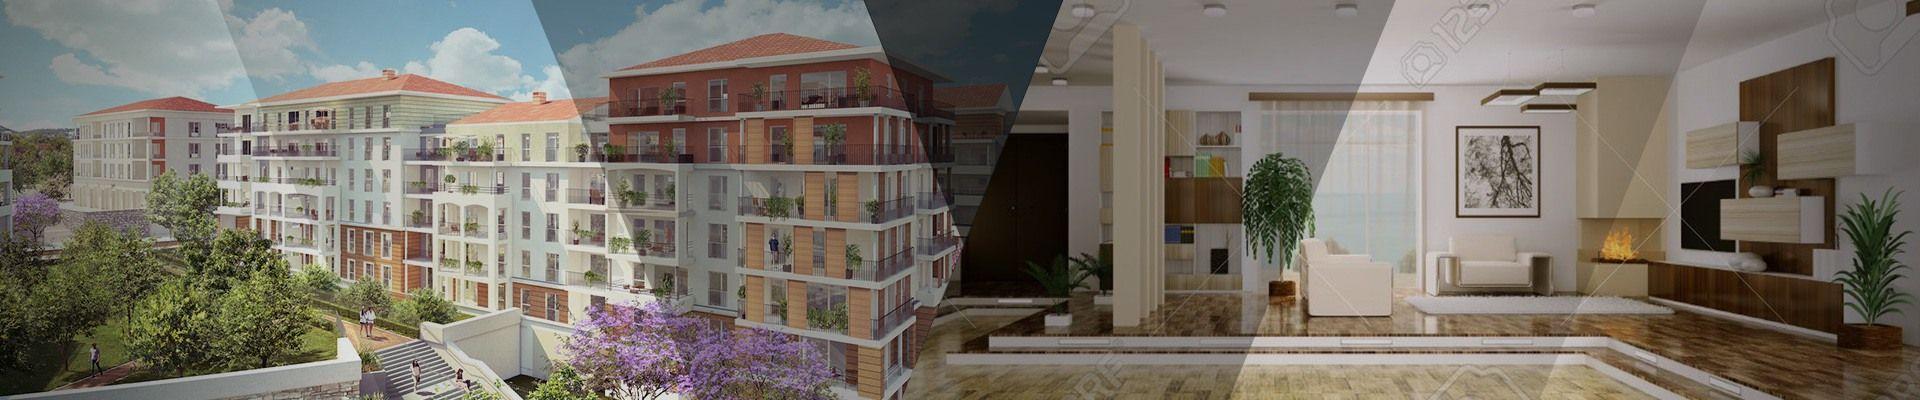 Le Crowdfunding Immobilier - Cheval Blanc Patrimoine